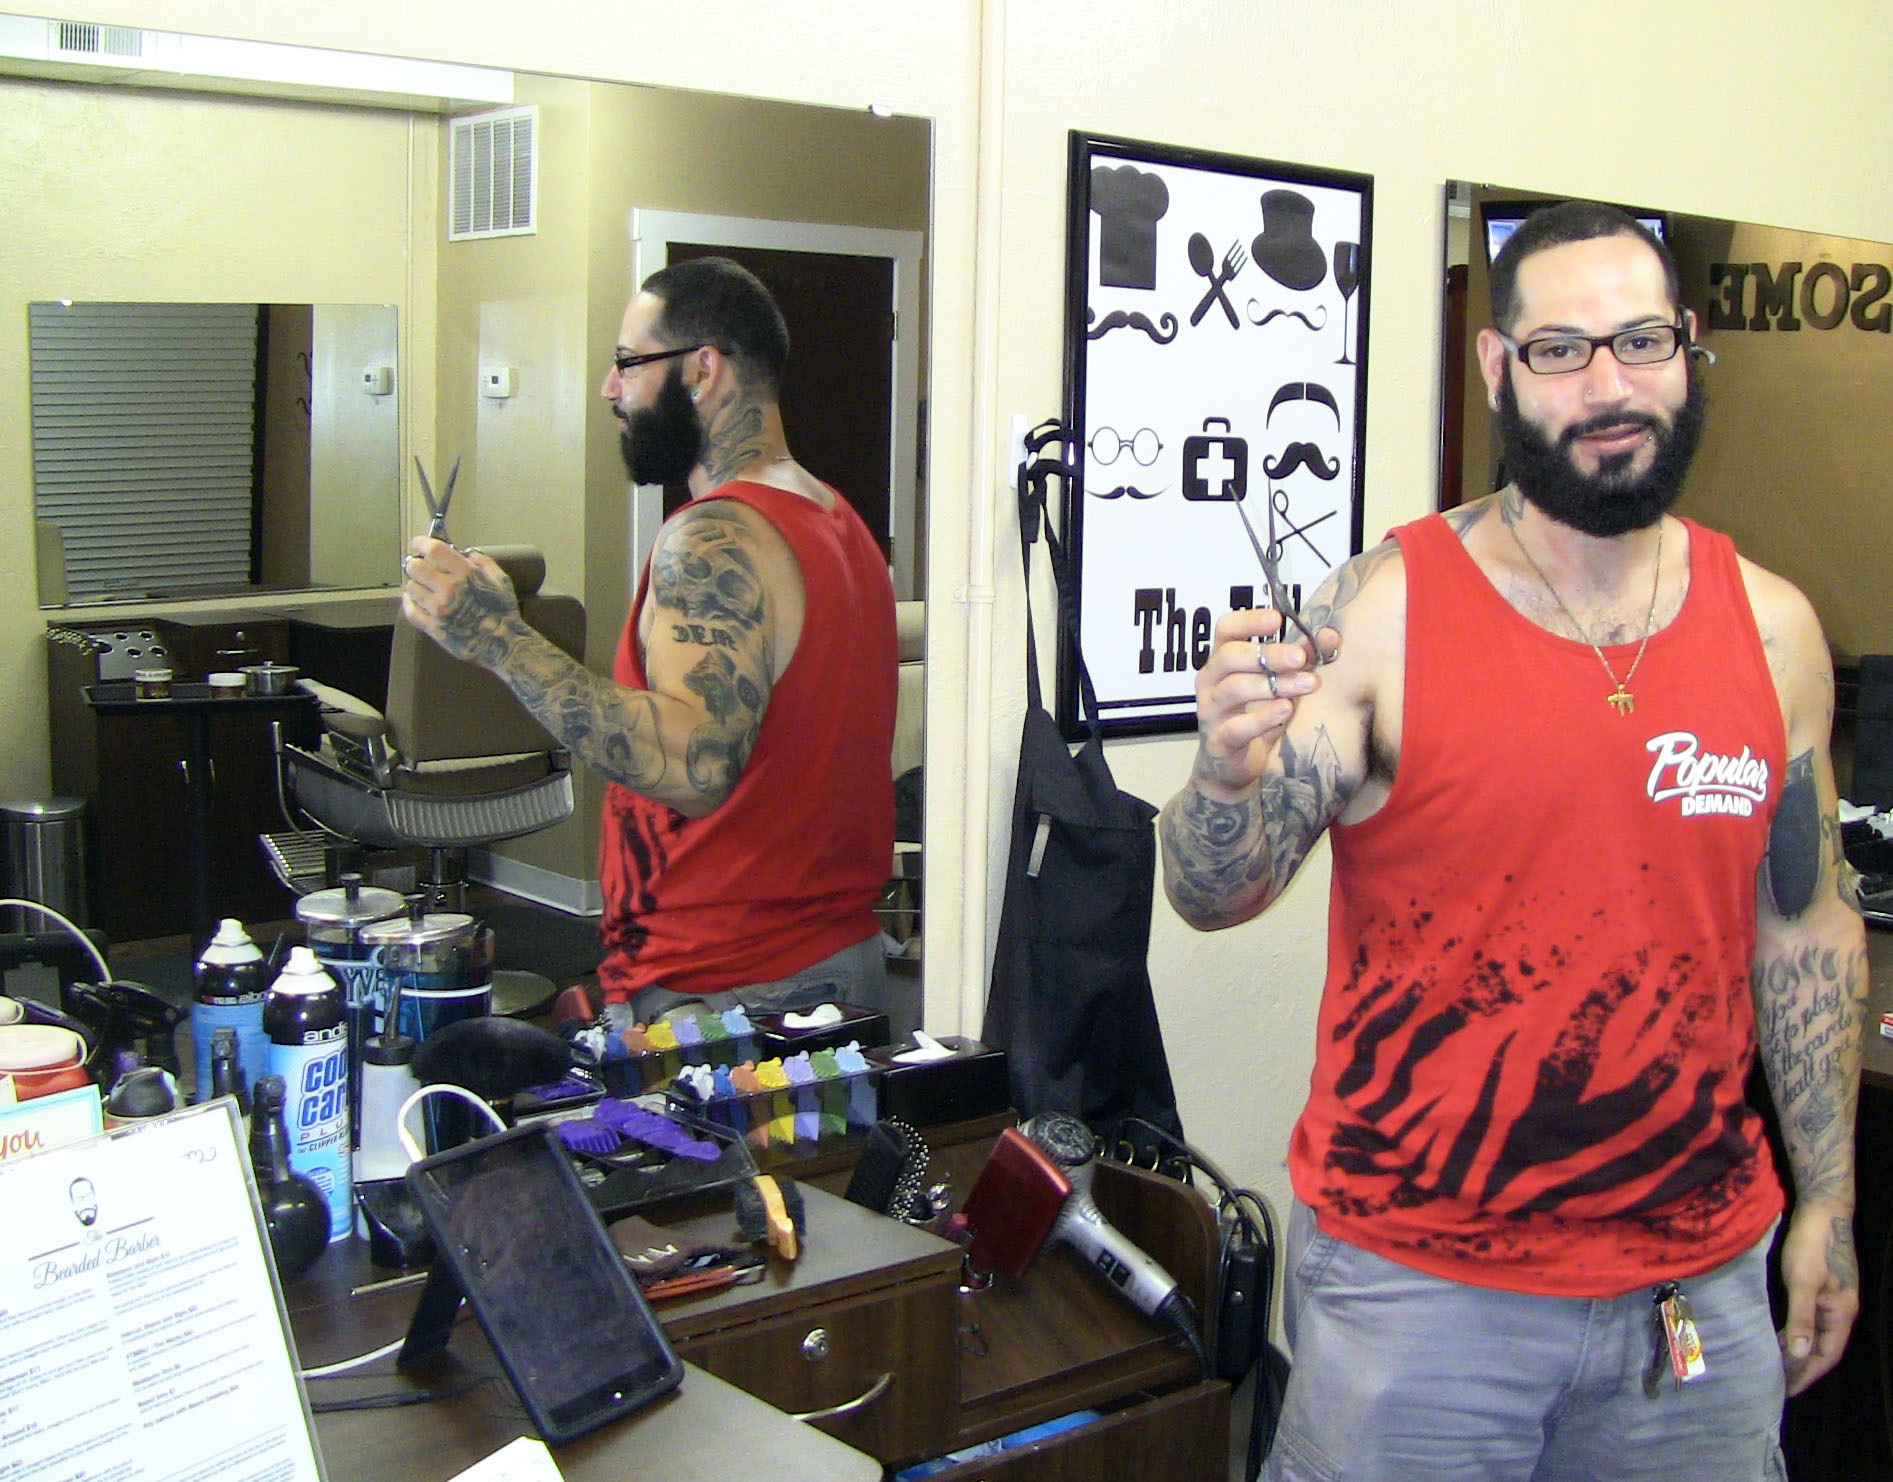 735cfb63b54a596c016d_Mitchell_Cohen_AKA_The_Bearded_Barber.jpg